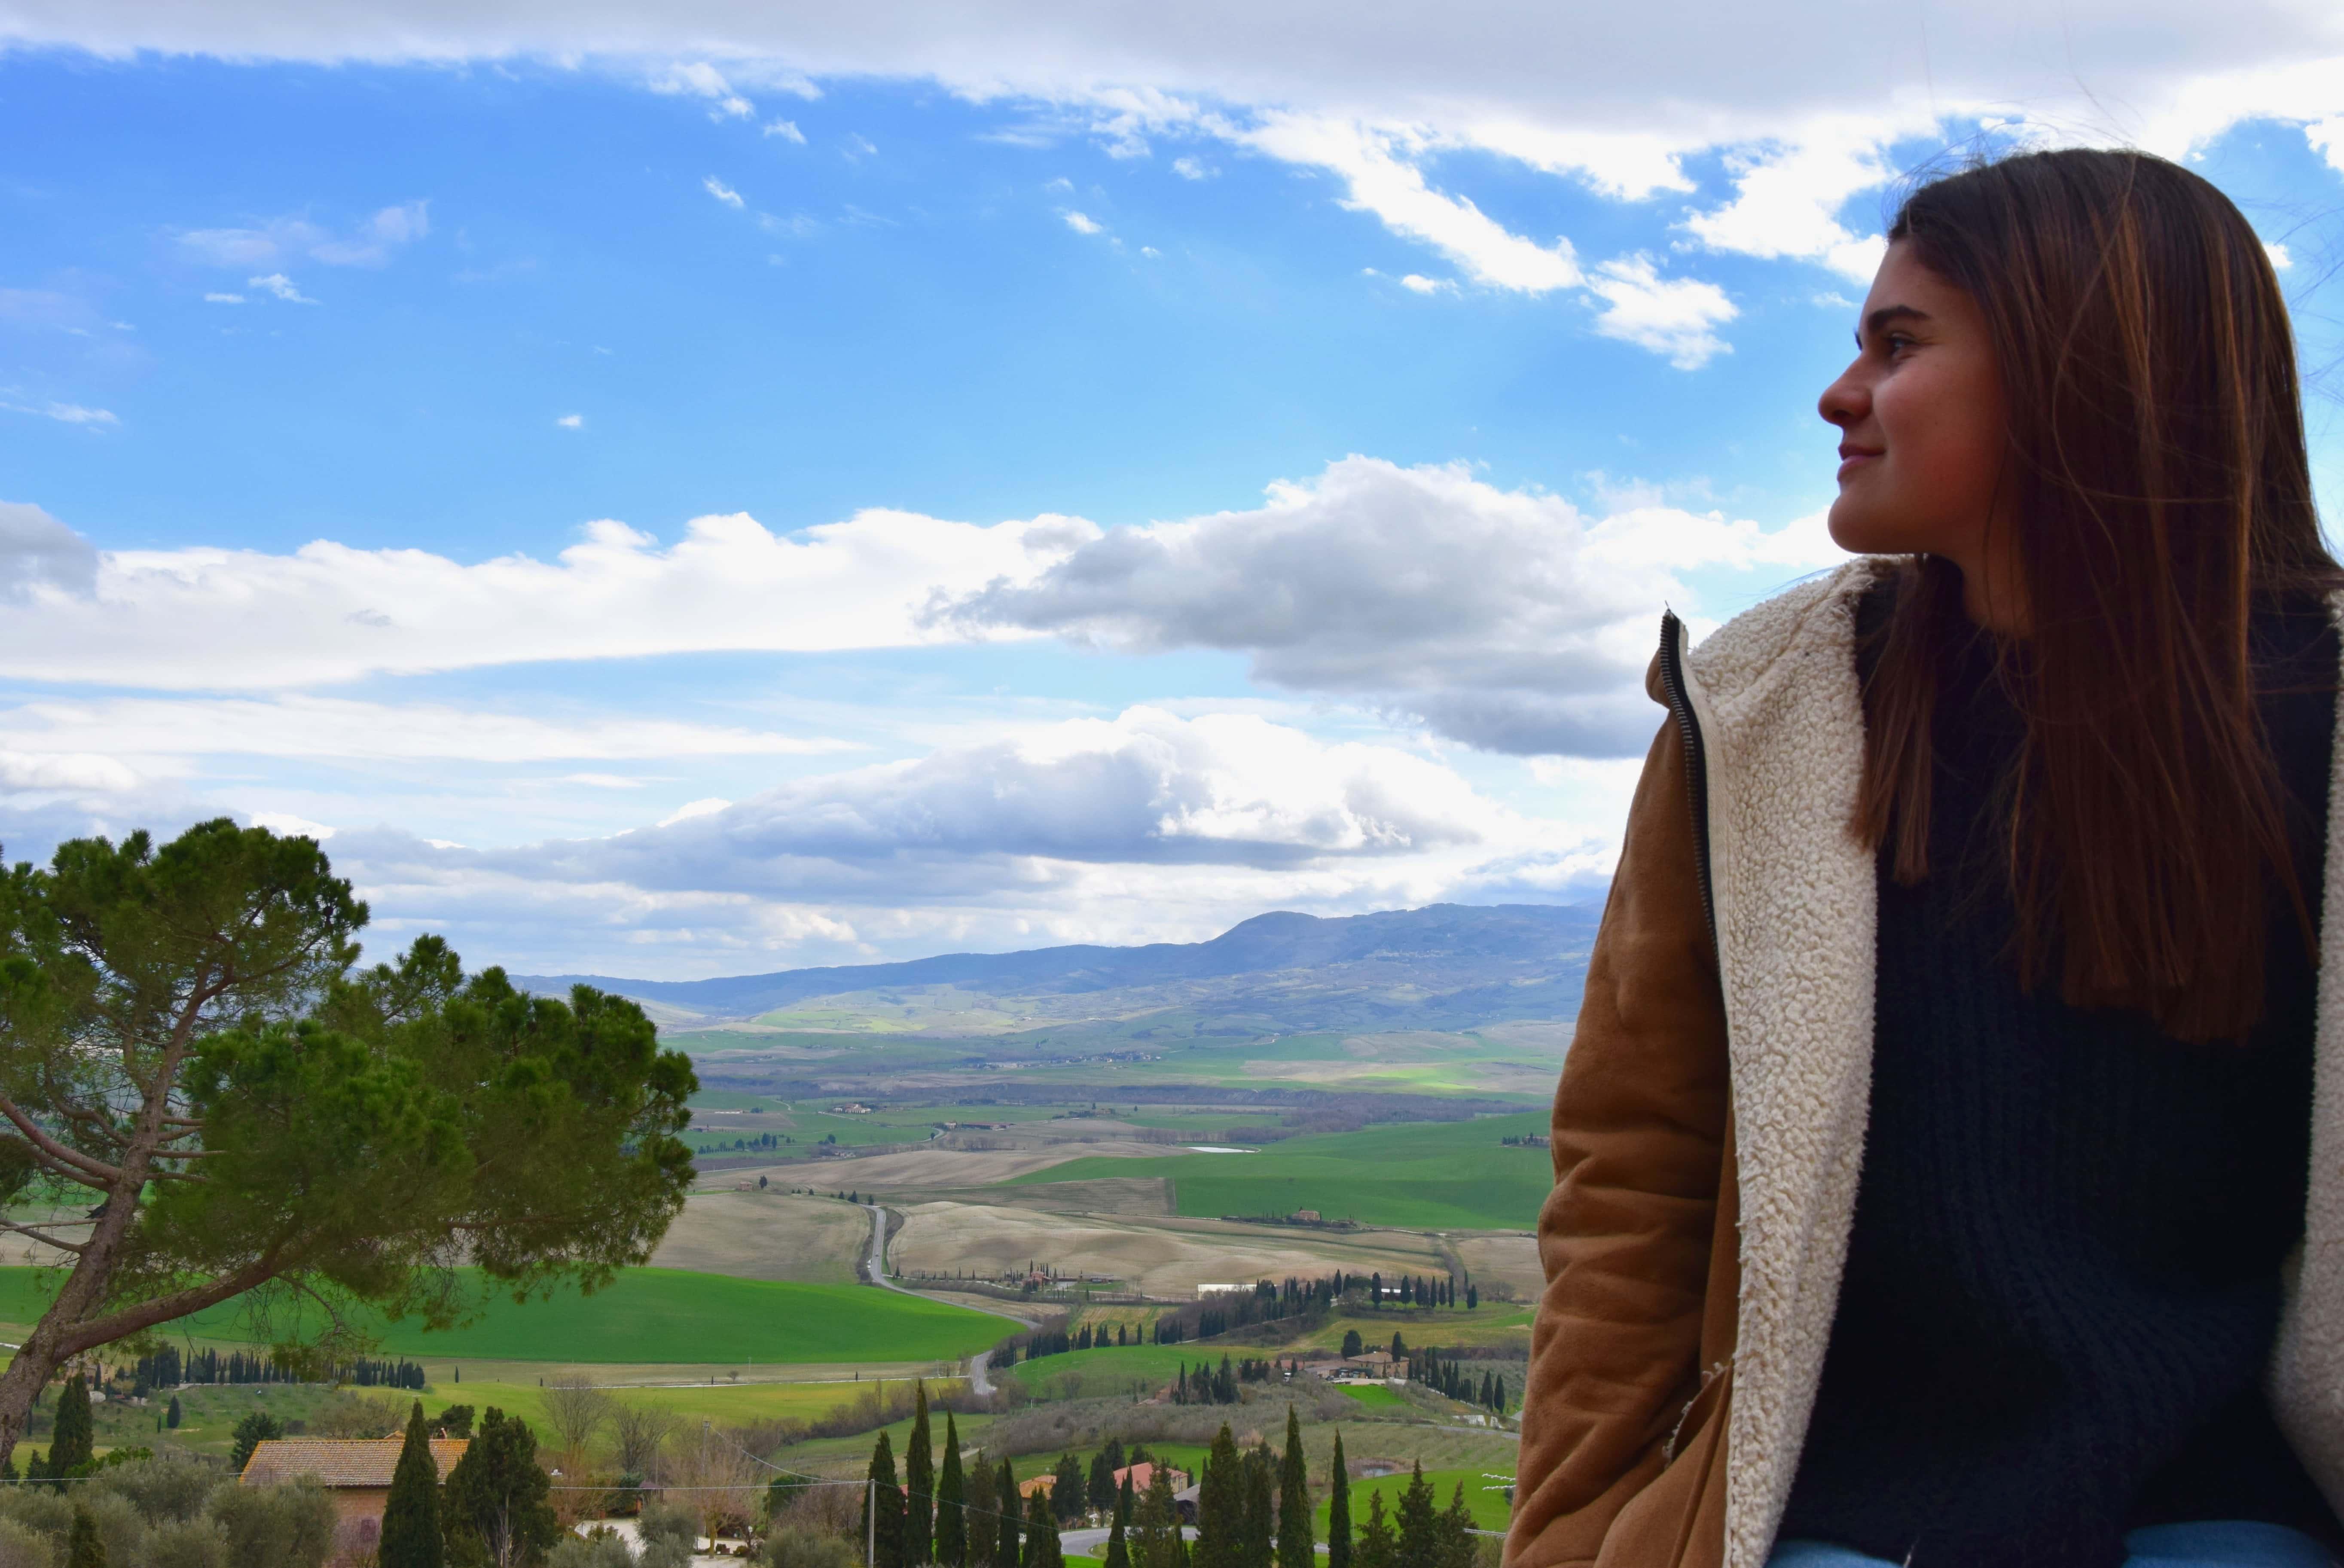 Ruta Por El Valle del Chianti (Toscana) Italia